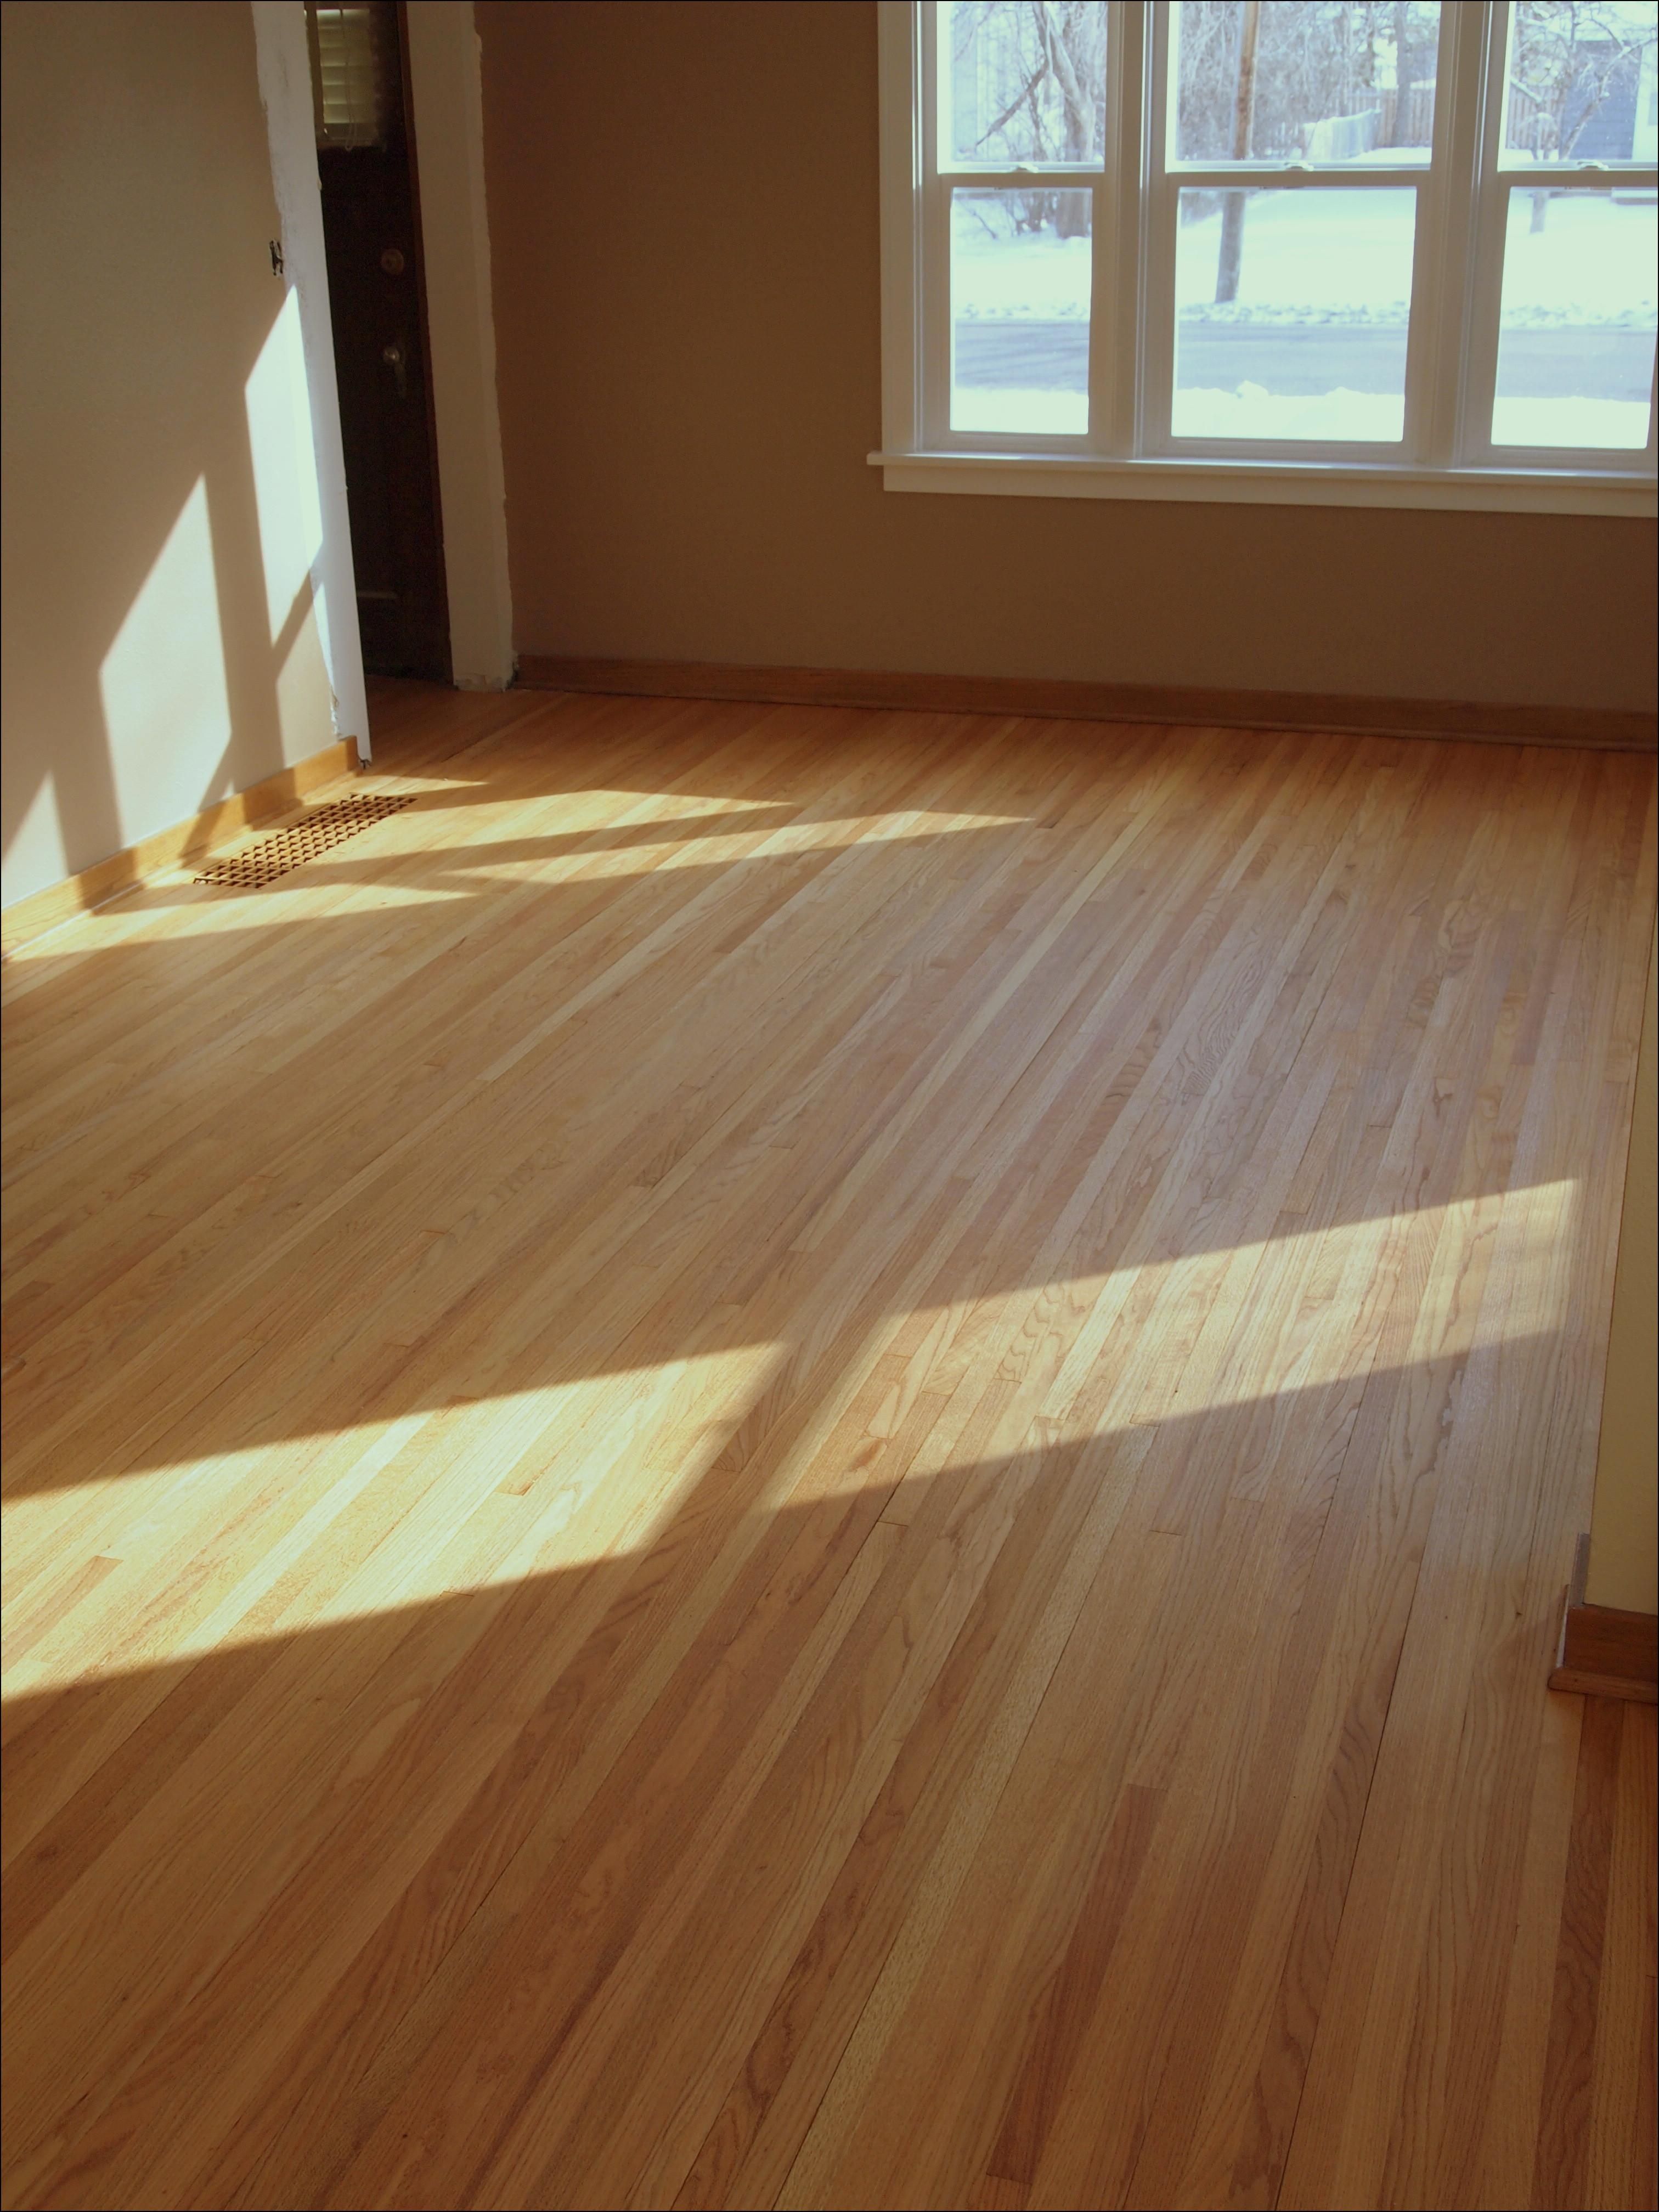 unfinished birch hardwood flooring of 2 white oak flooring unfinished collection mullican flooring home with regard to 2 white oak flooring unfinished galerie oak wood flooring of 2 white oak flooring unfinished collection